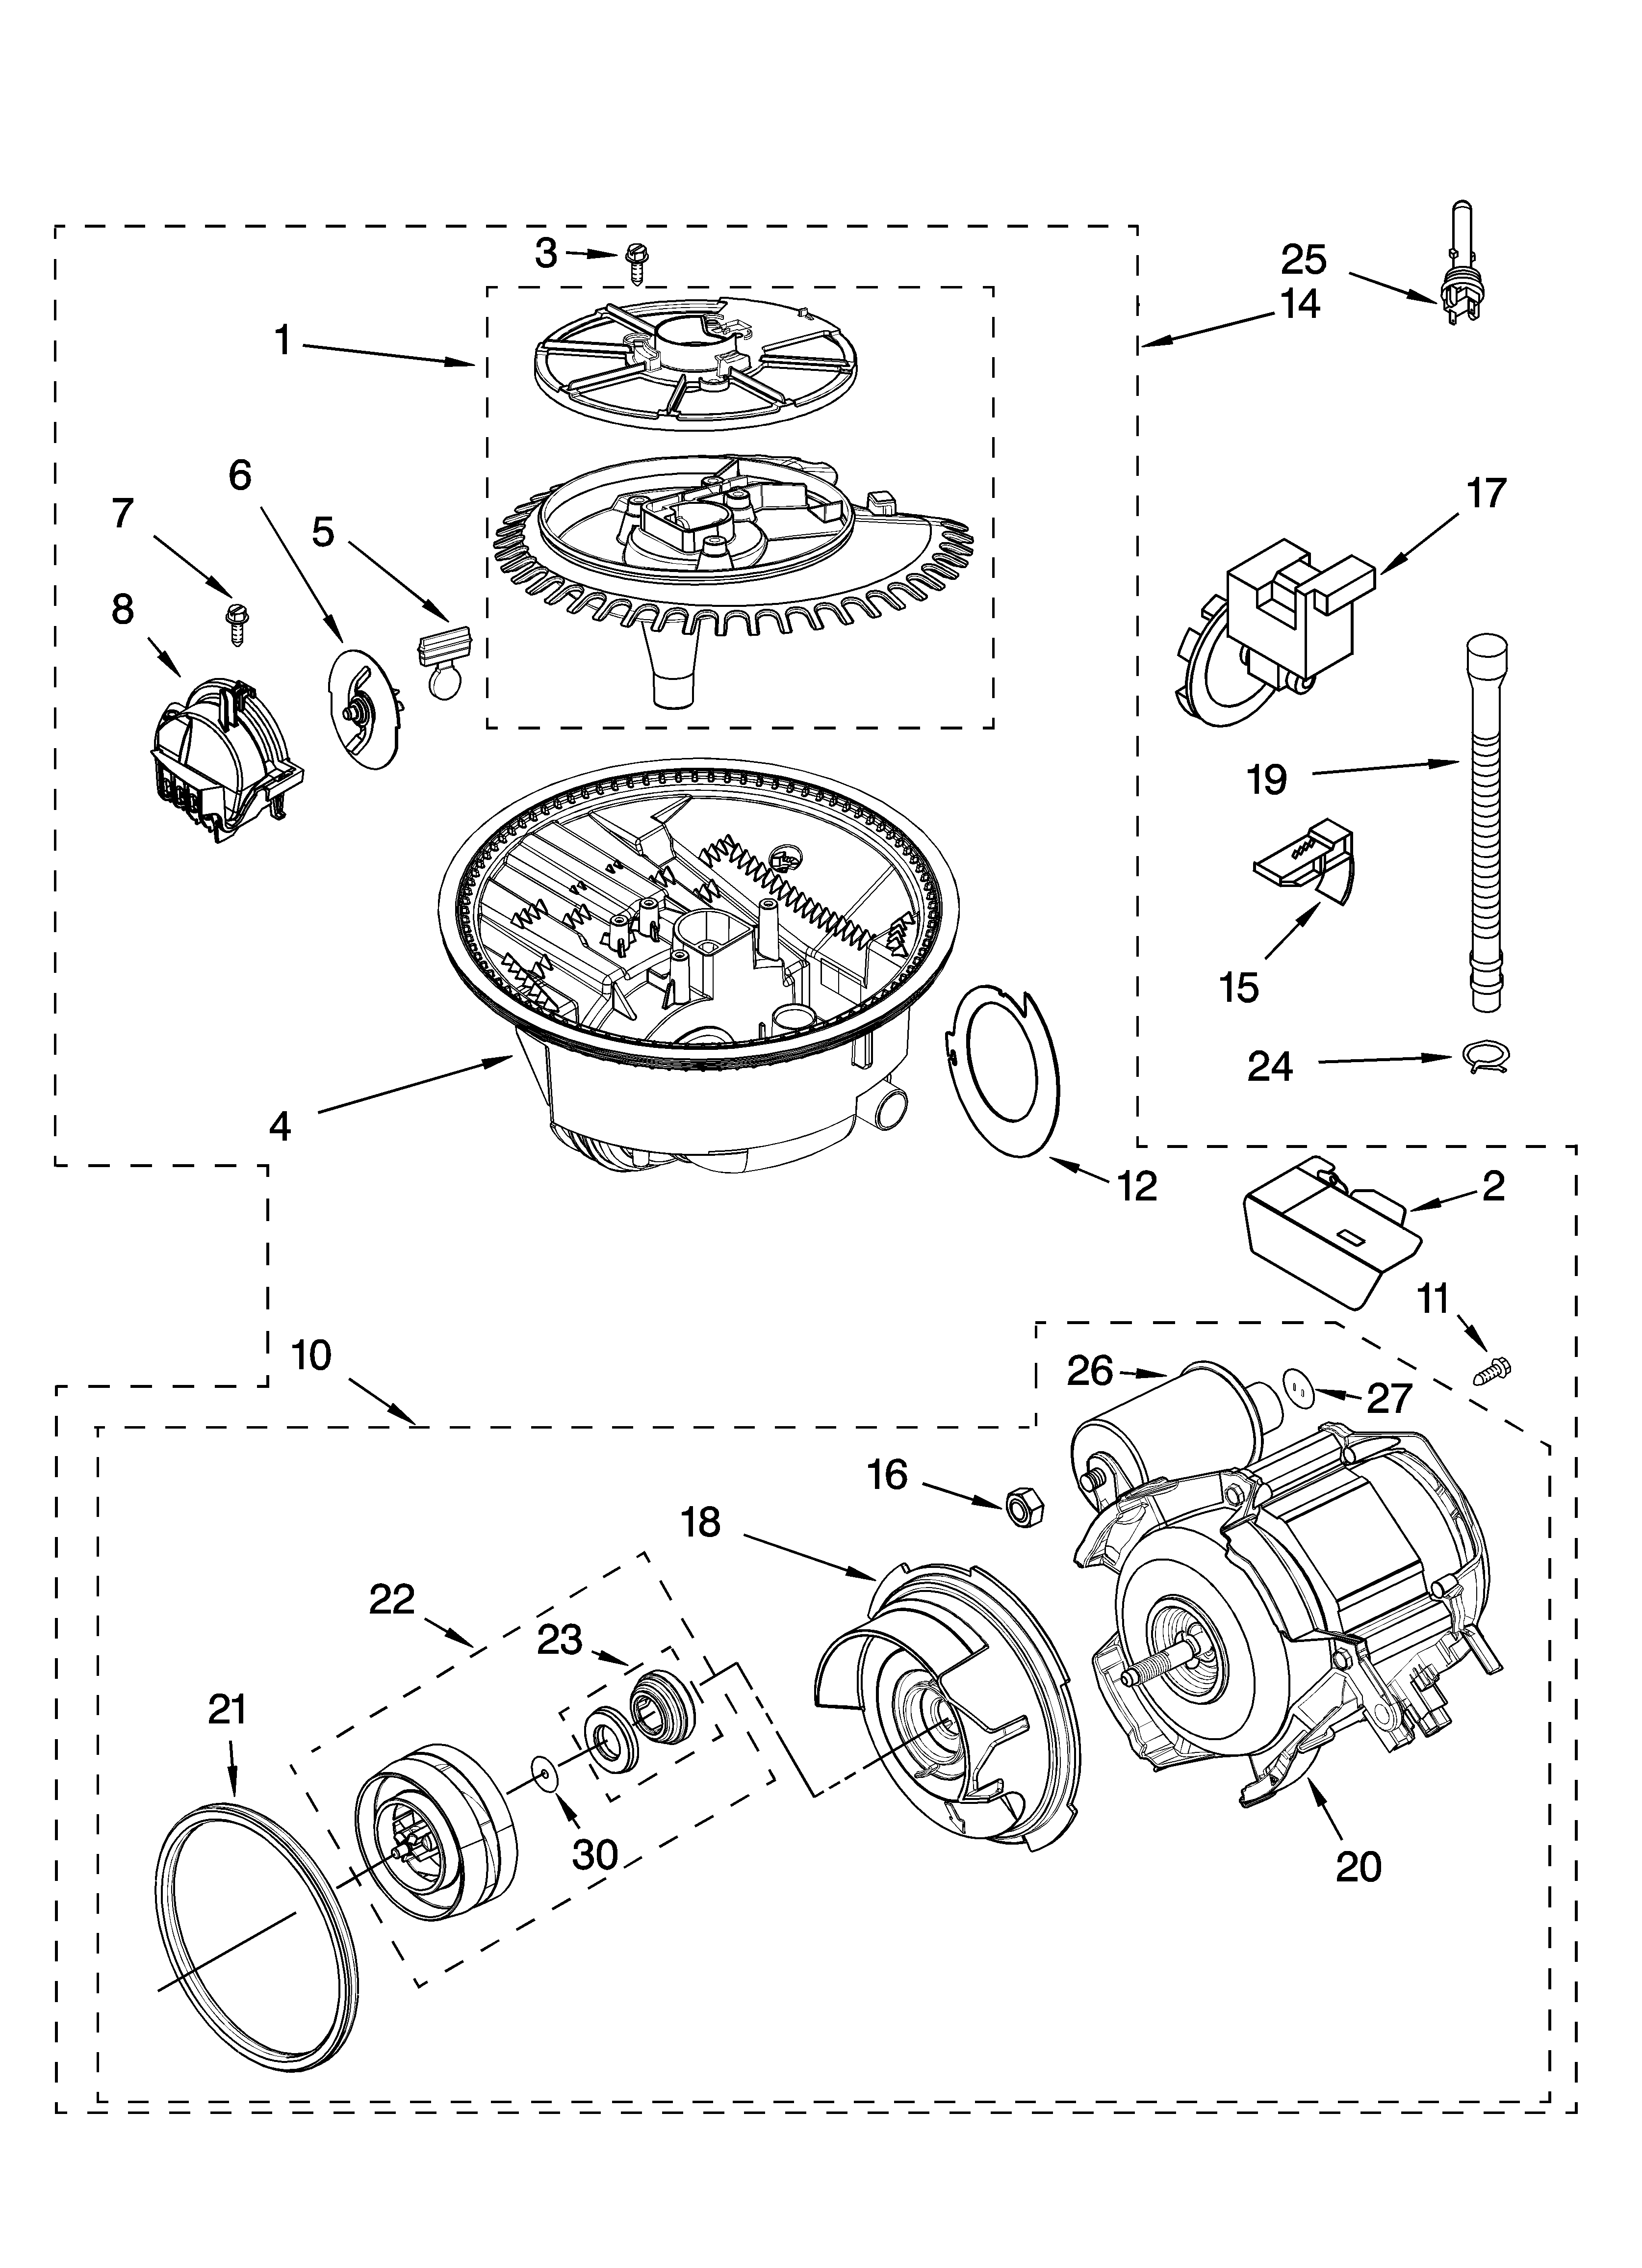 K on Kenmore Ultra Wash Dishwasher Parts Diagram